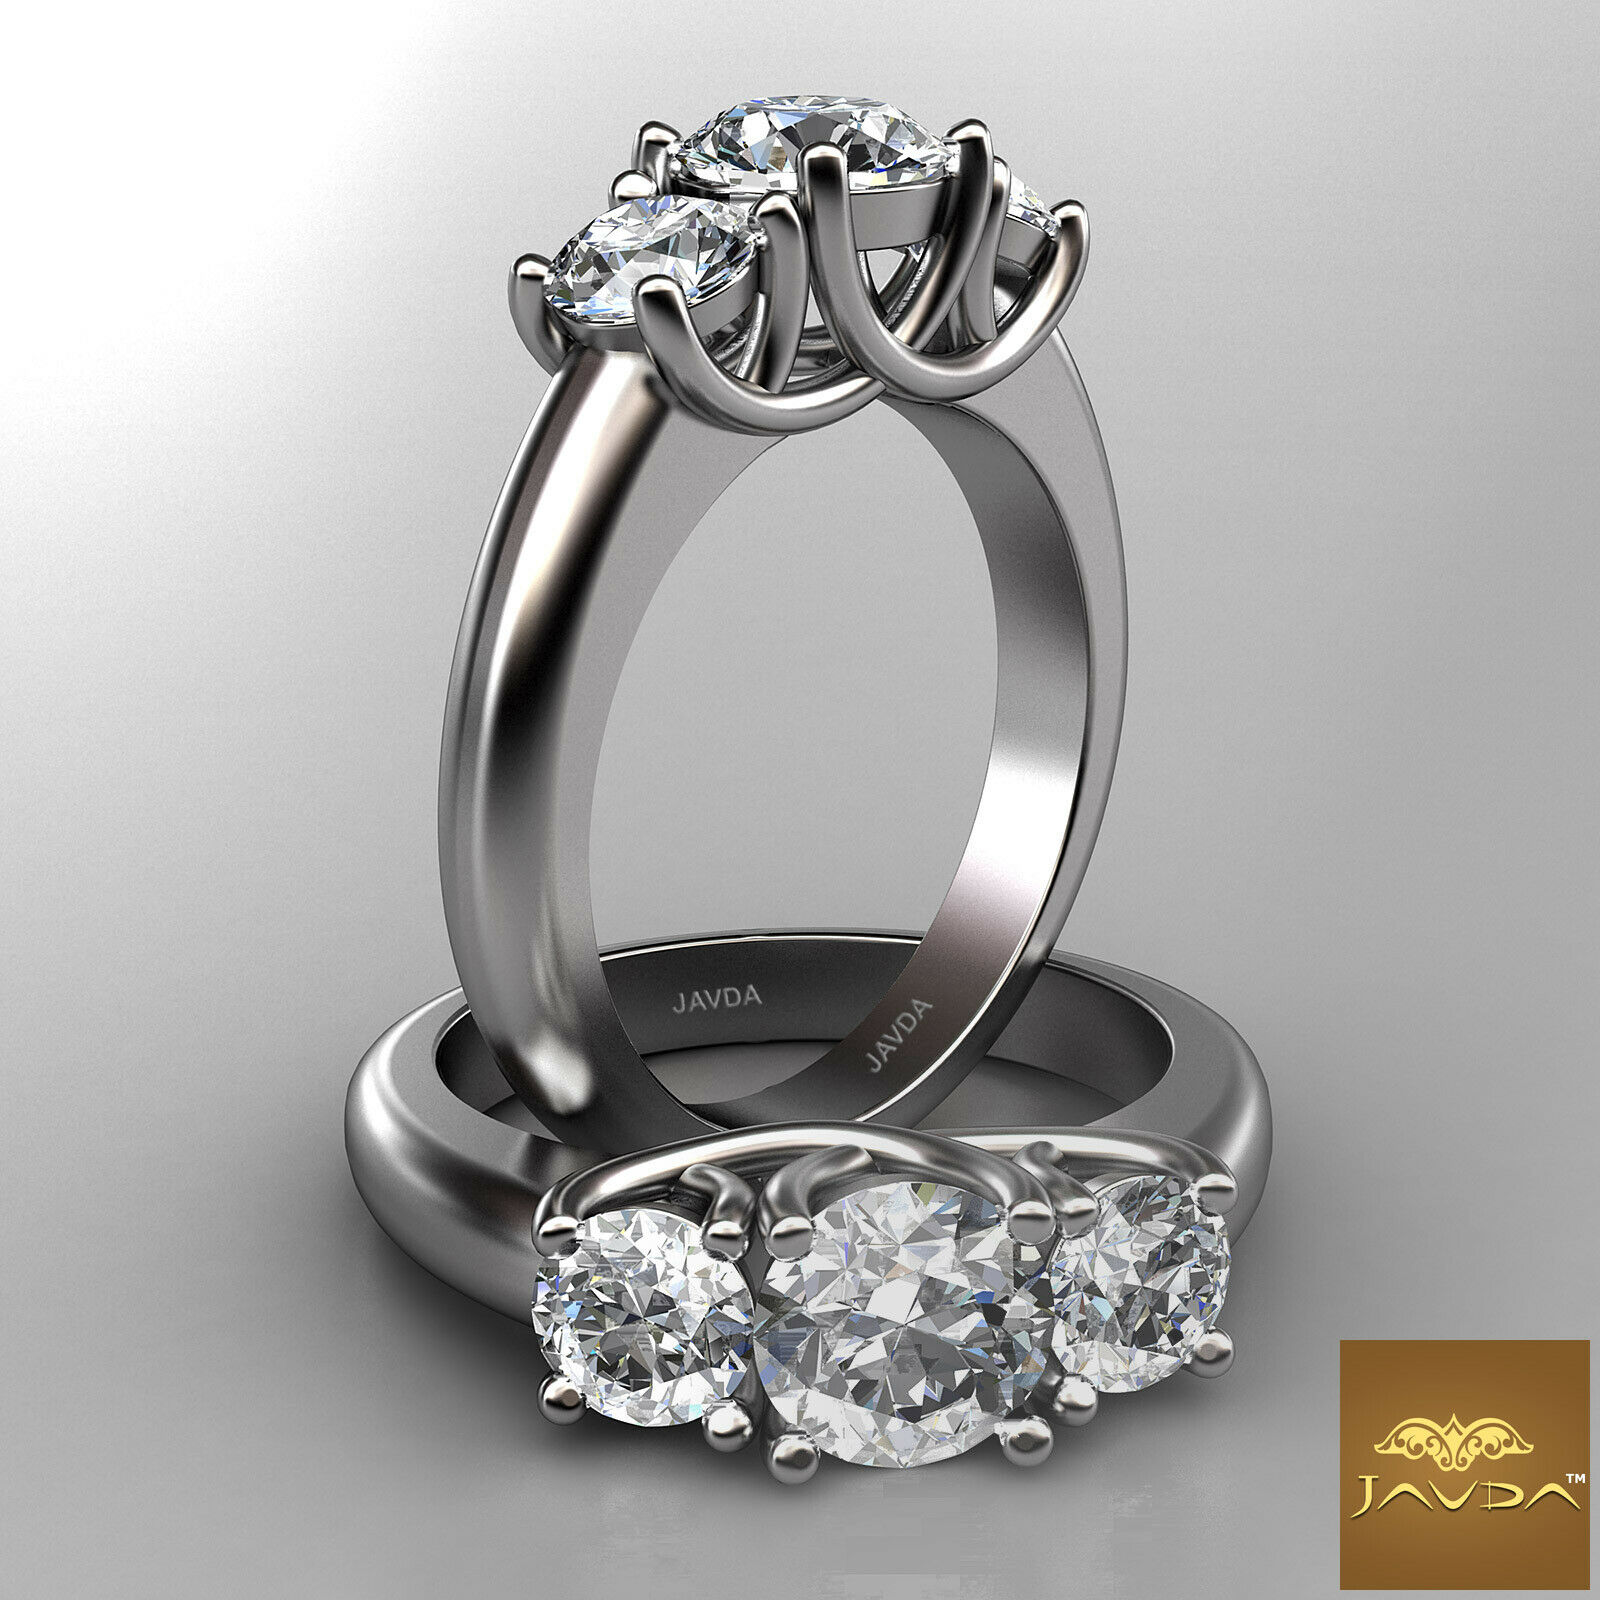 2.3ct Brilliant Round Diamond 3 Stone GIA F VS1 Platinum Javda Engagement Ring